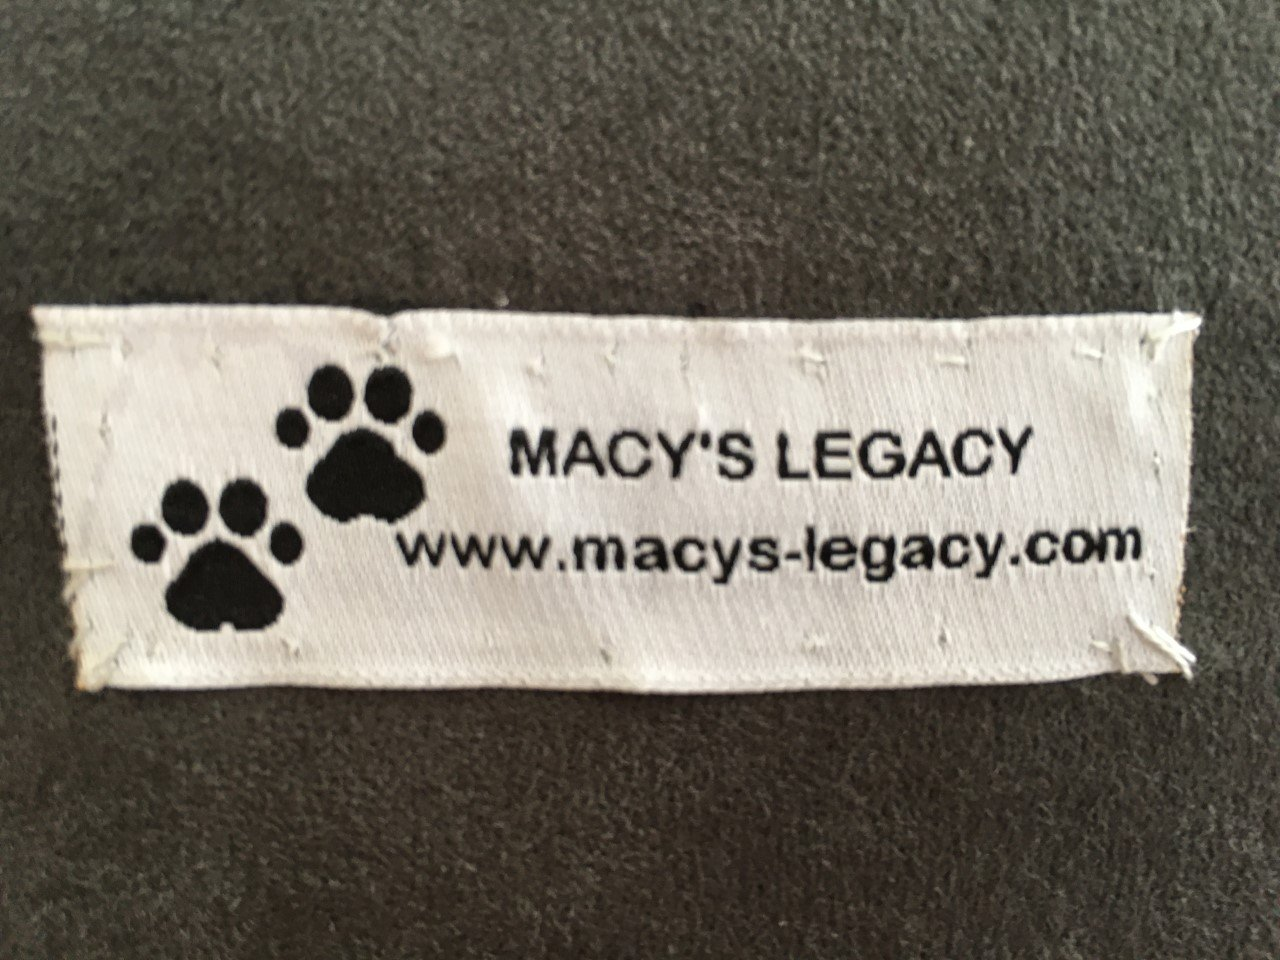 Macy's Legacy Merchandise